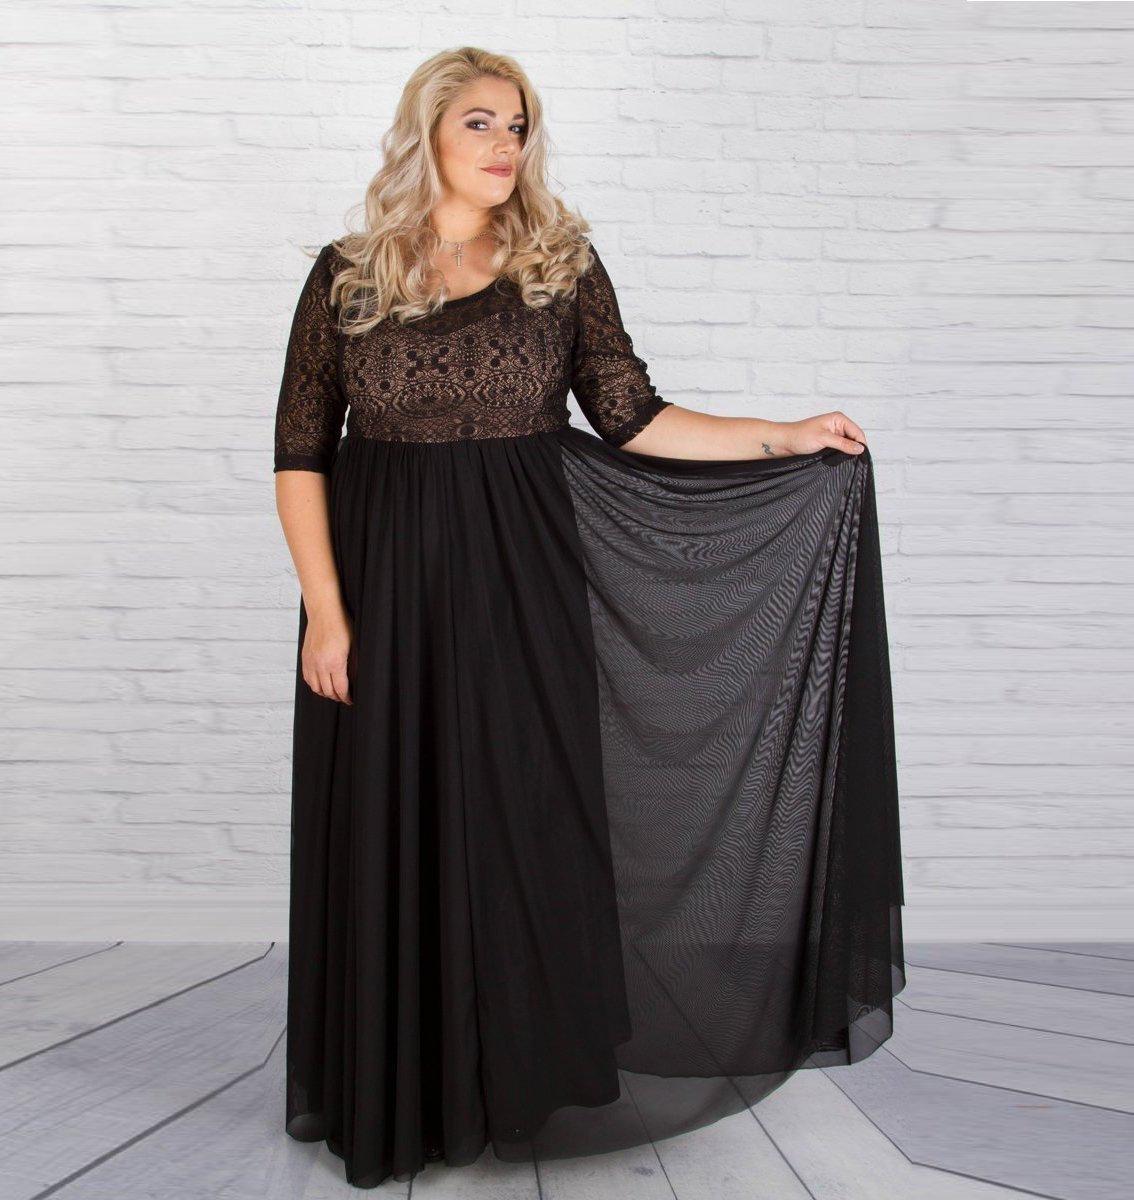 Women Dress Black Dress Plus Size Dress Formal Dress Maxi | Etsy